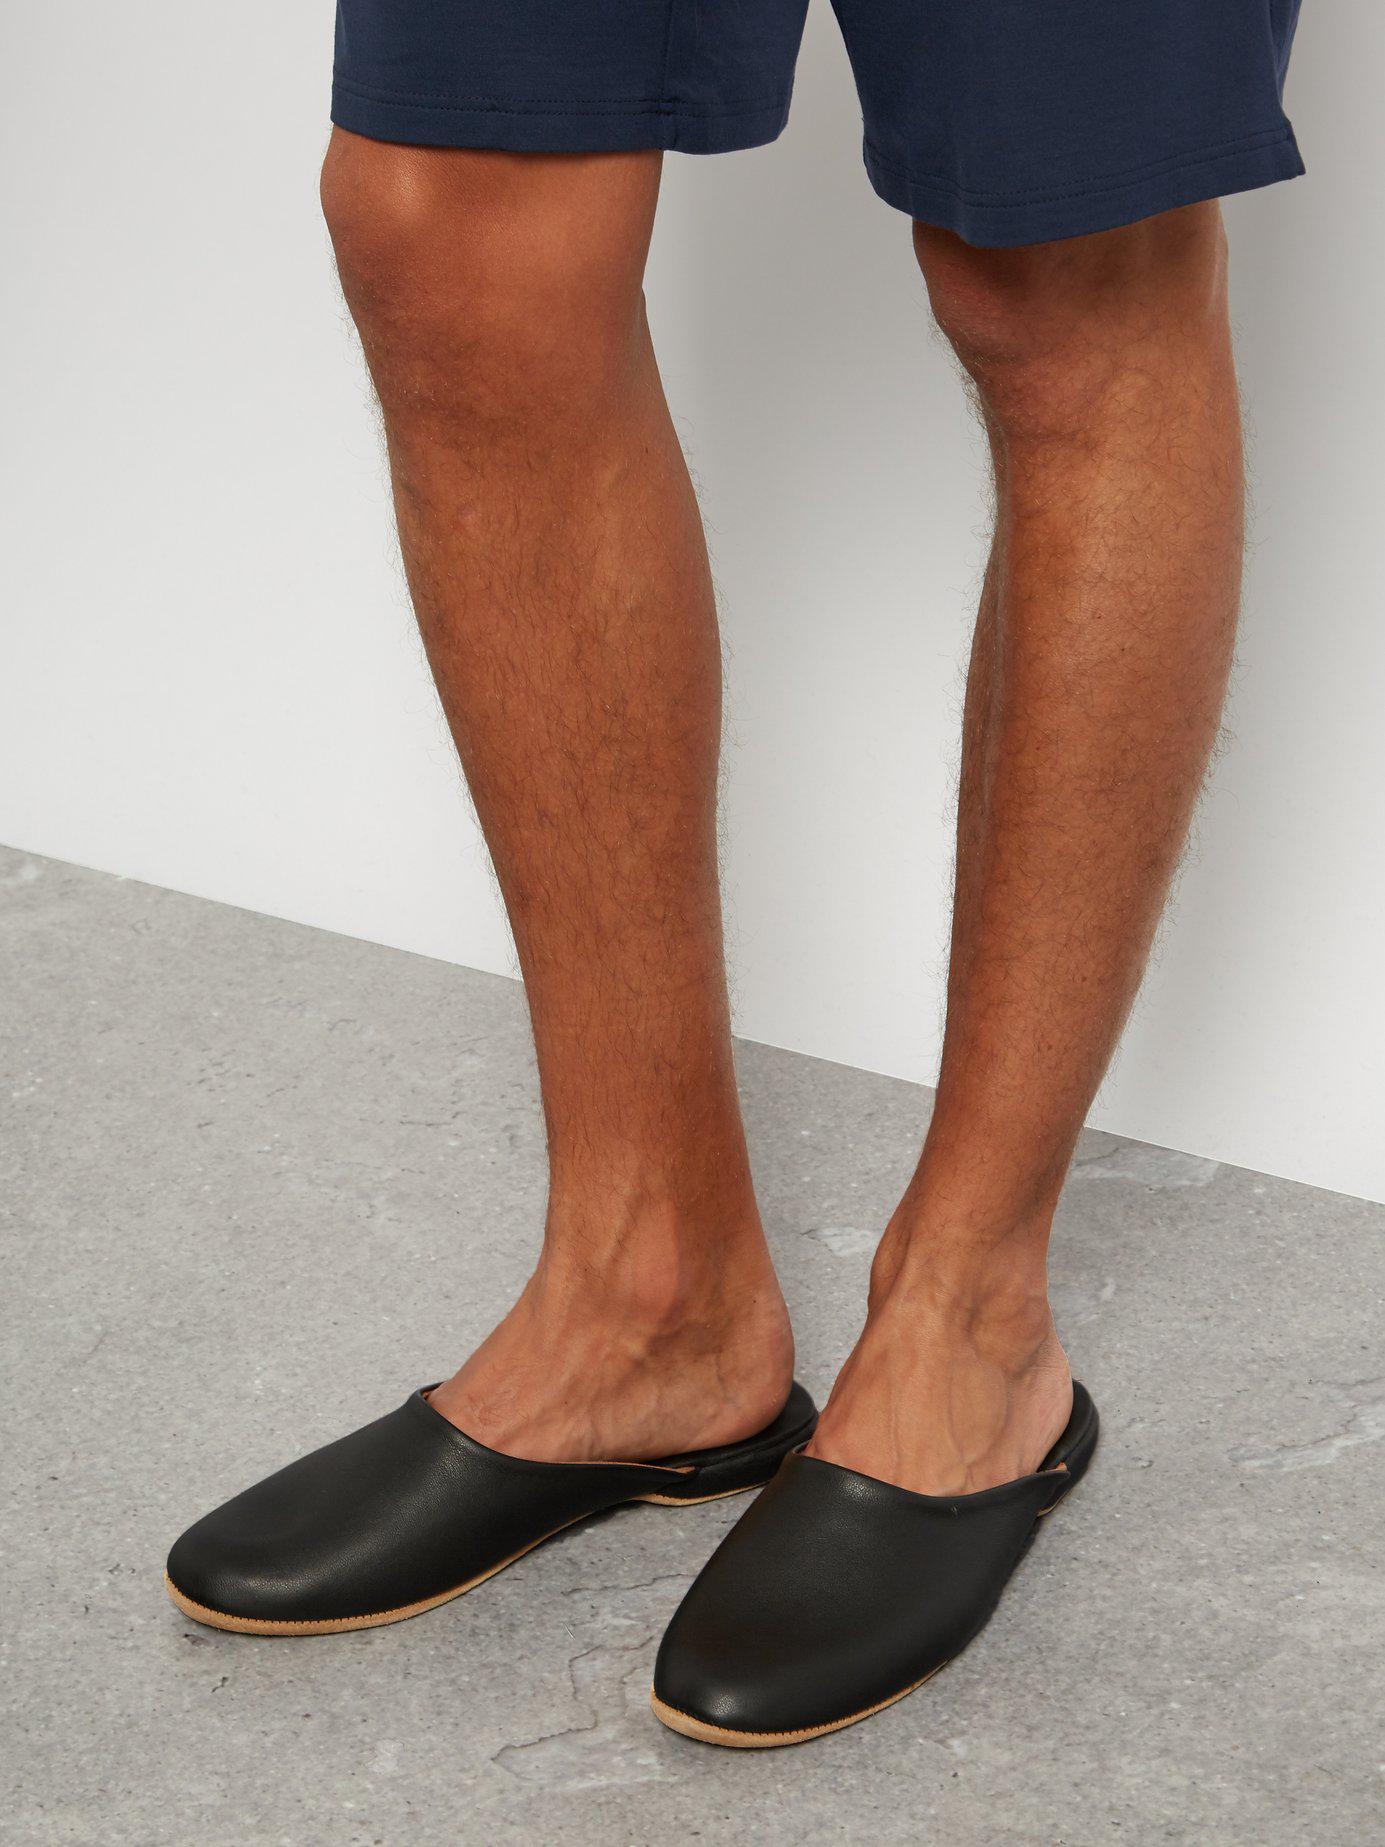 a9216639b0abf Lyst - Derek Rose Morgan Leather Slipper Shoes in Black for Men